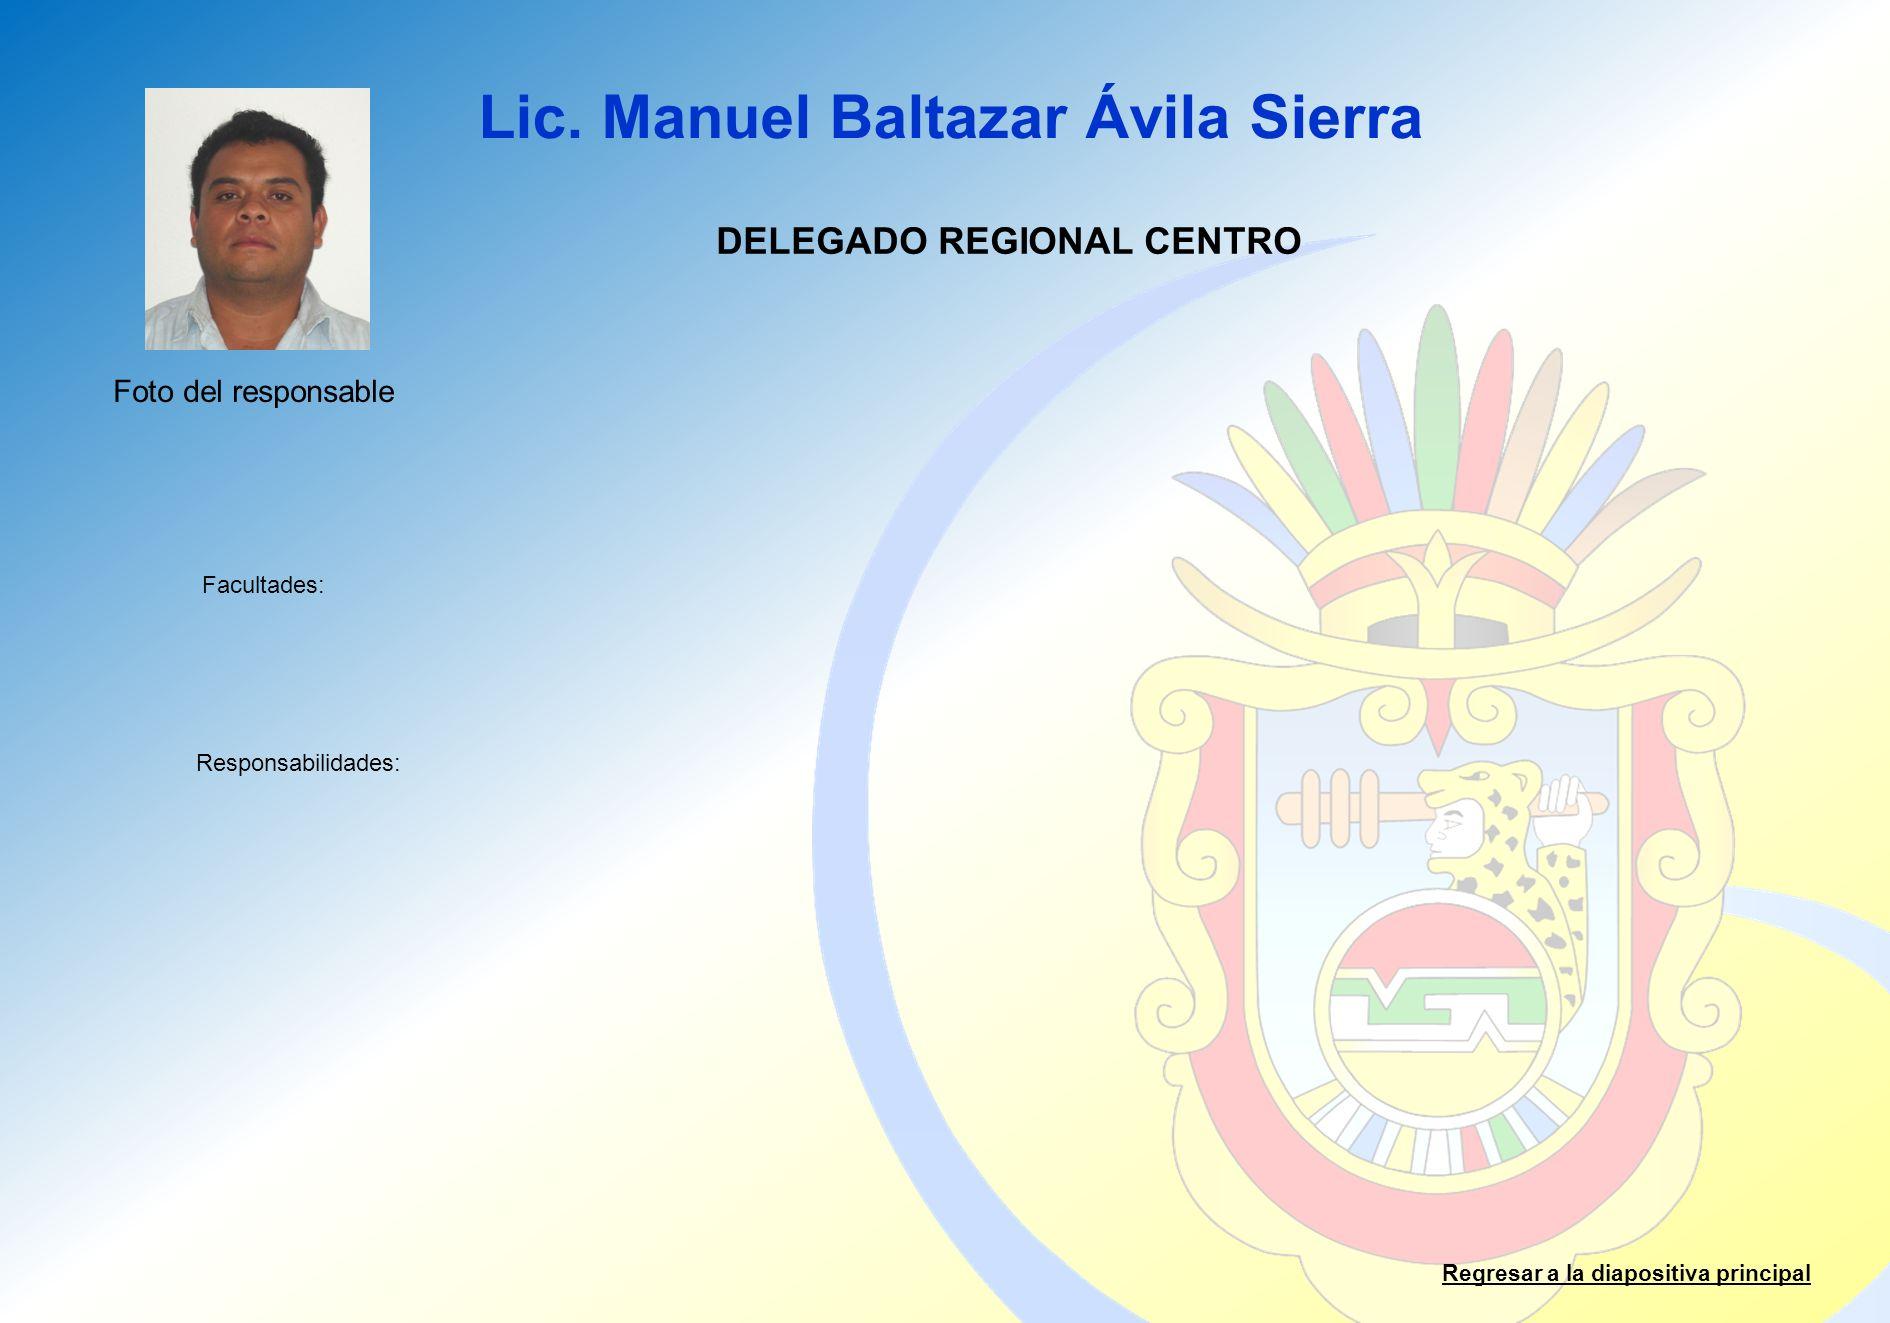 DELEGADO REGIONAL CENTRO